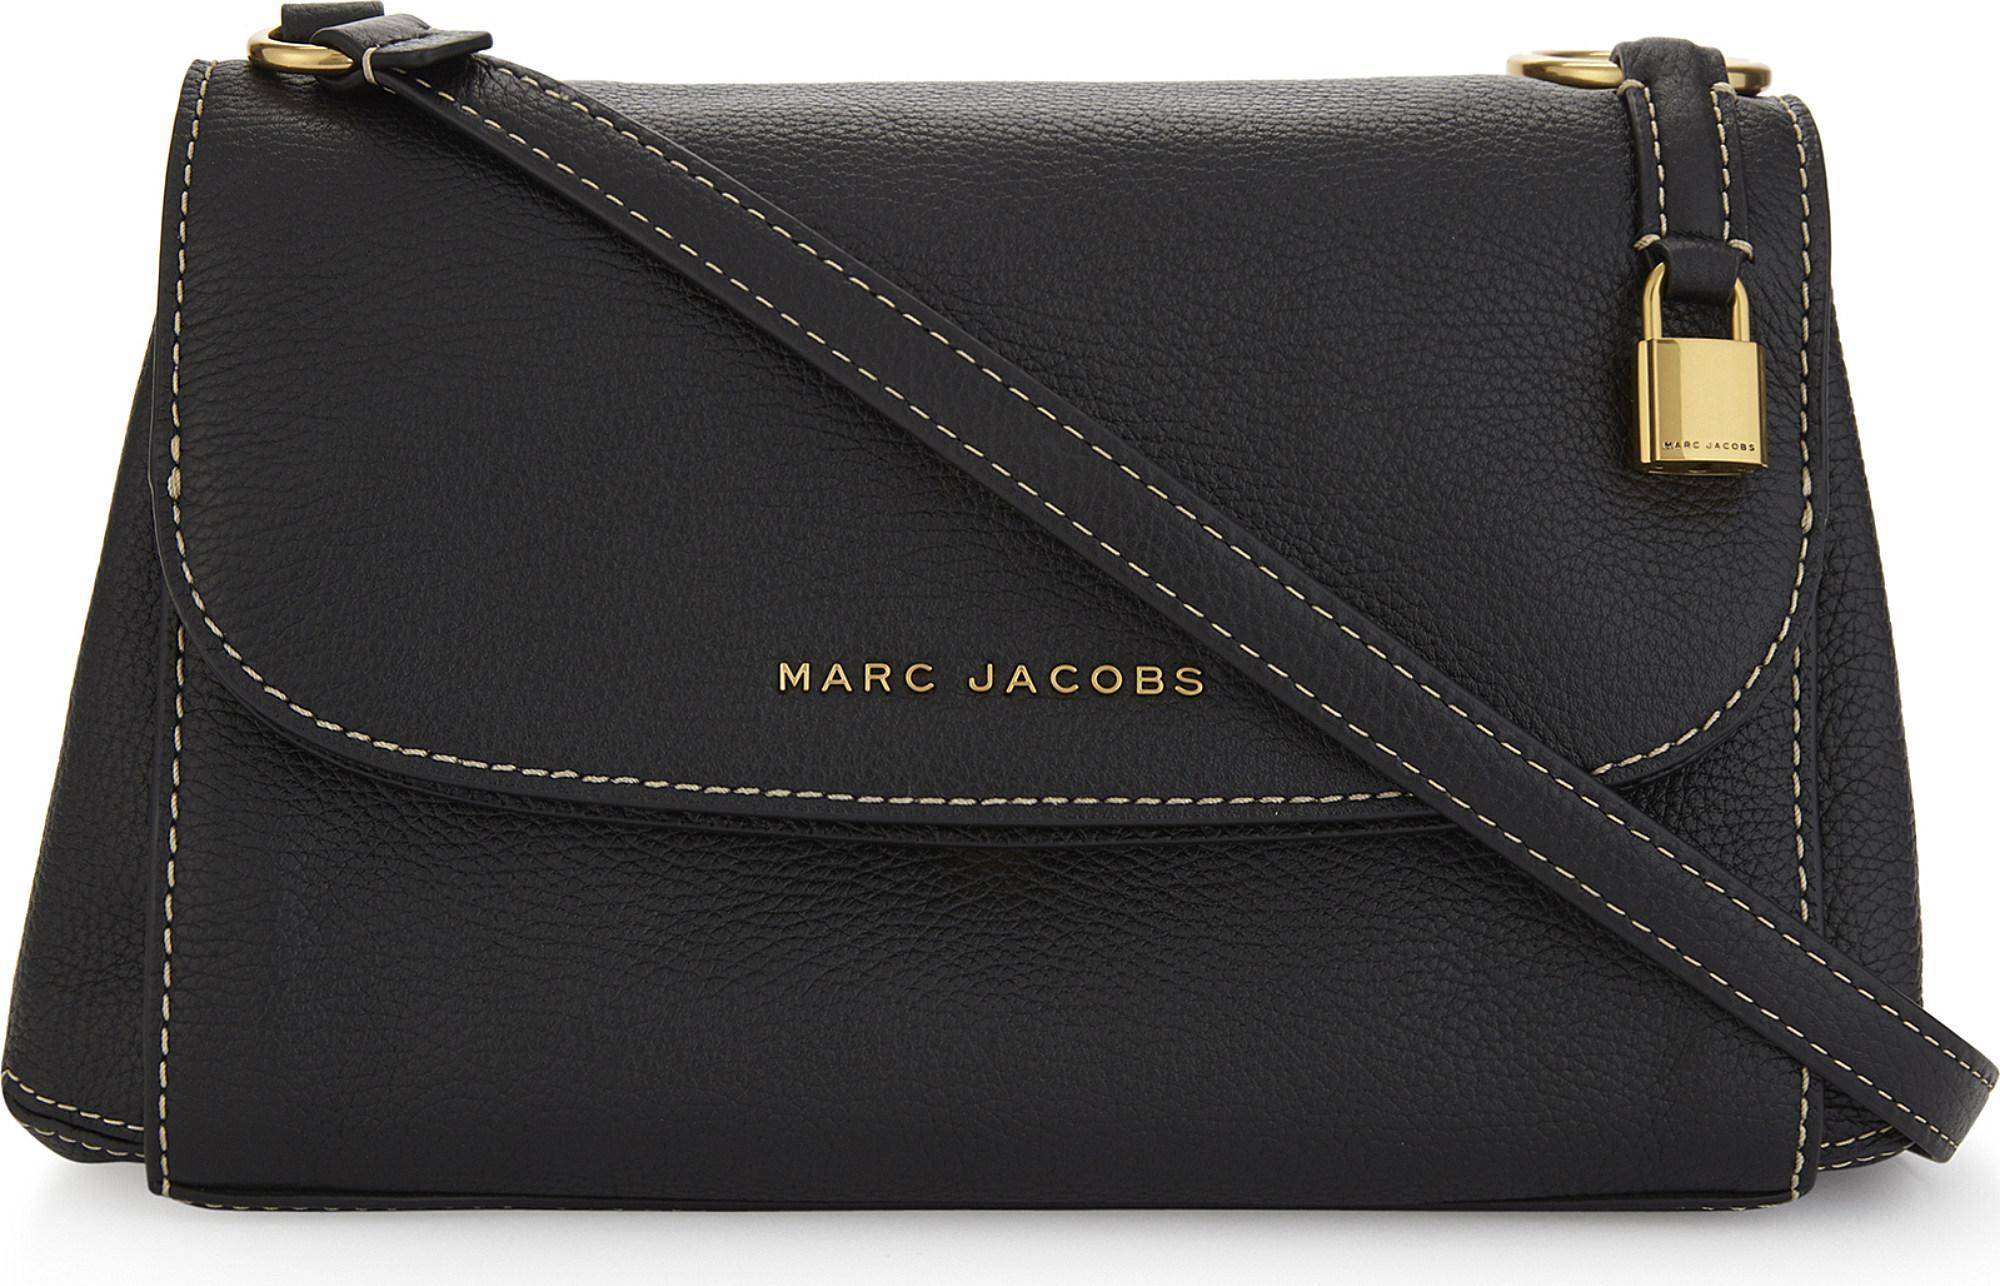 007c170da9ff Marc Jacobs - Black Boho Grind Leather Cross-body Bag - Lyst. View  fullscreen